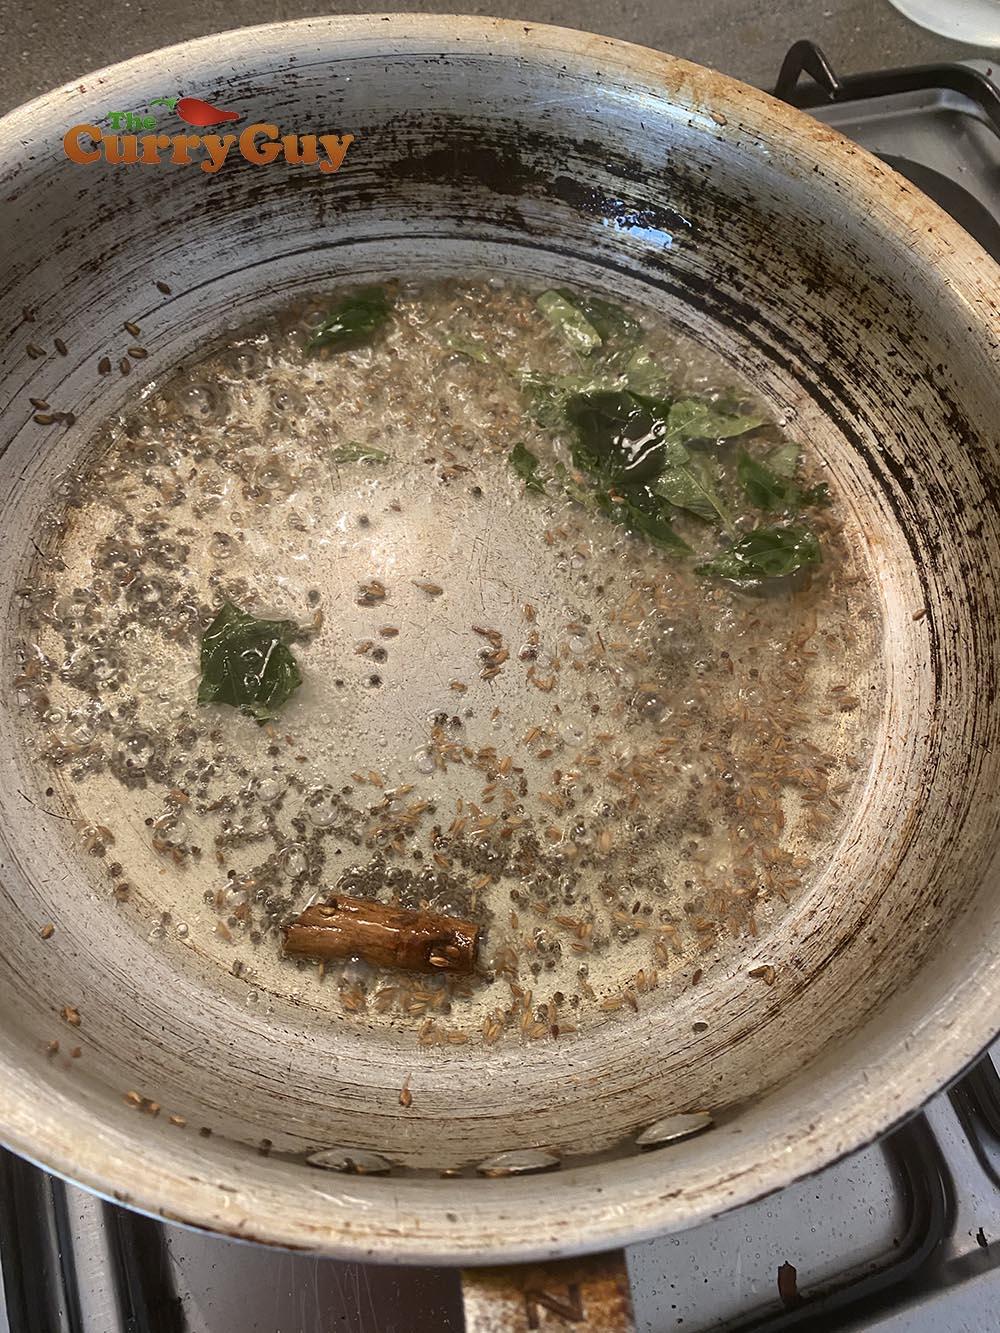 adding cinnamon, cumin, fenugreek and curry leaves